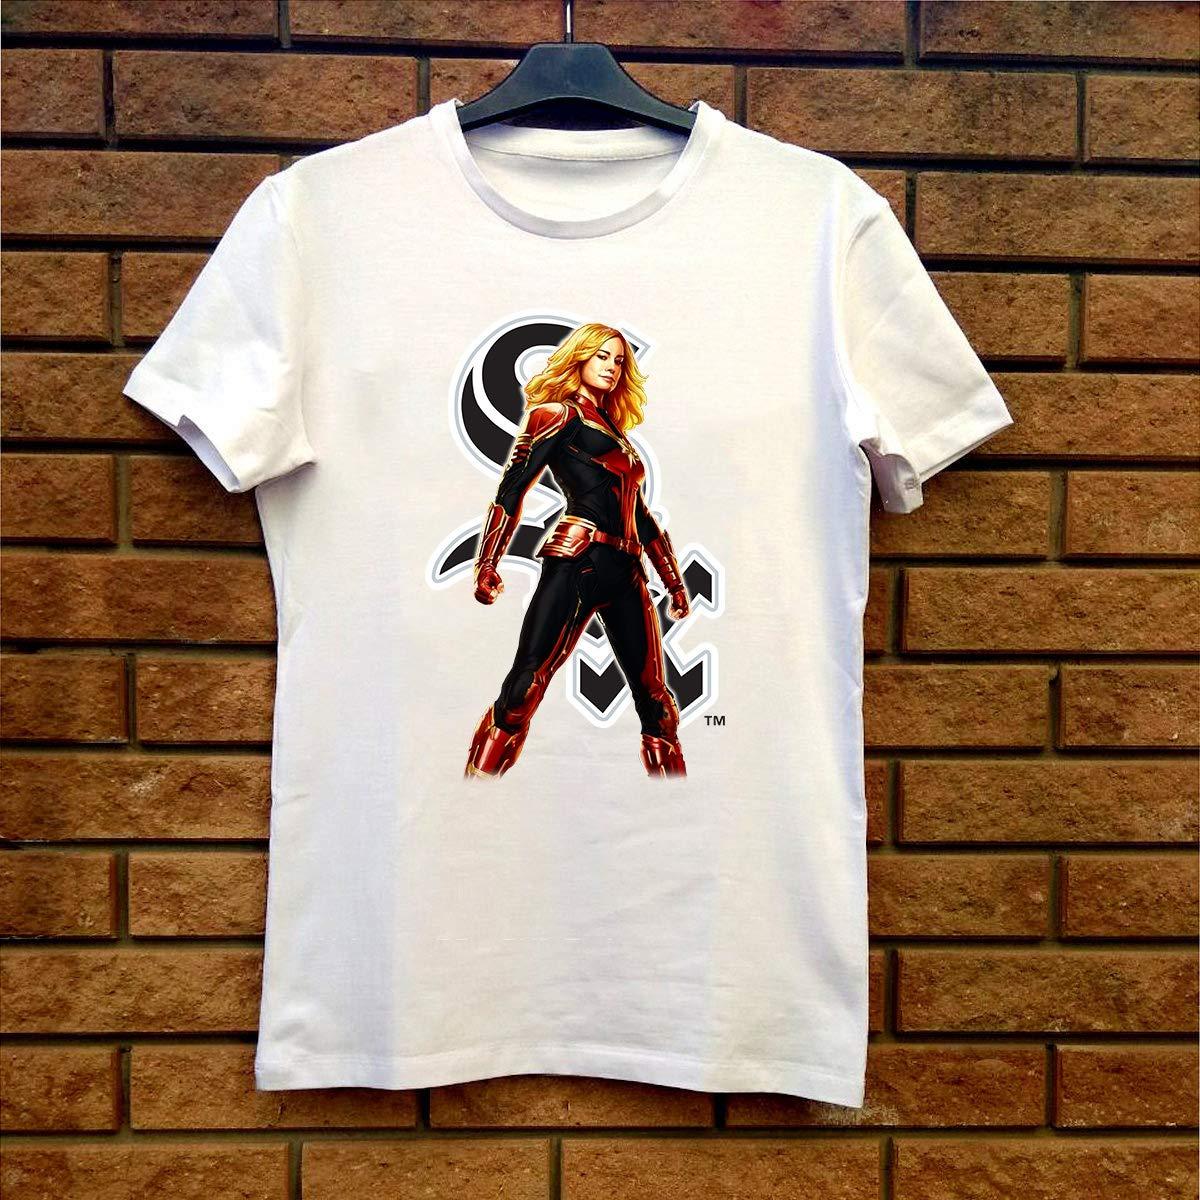 on sale 916b6 c74a6 Amazon.com: Captain Marvel Chicago-White-Sox Fan Gift T ...